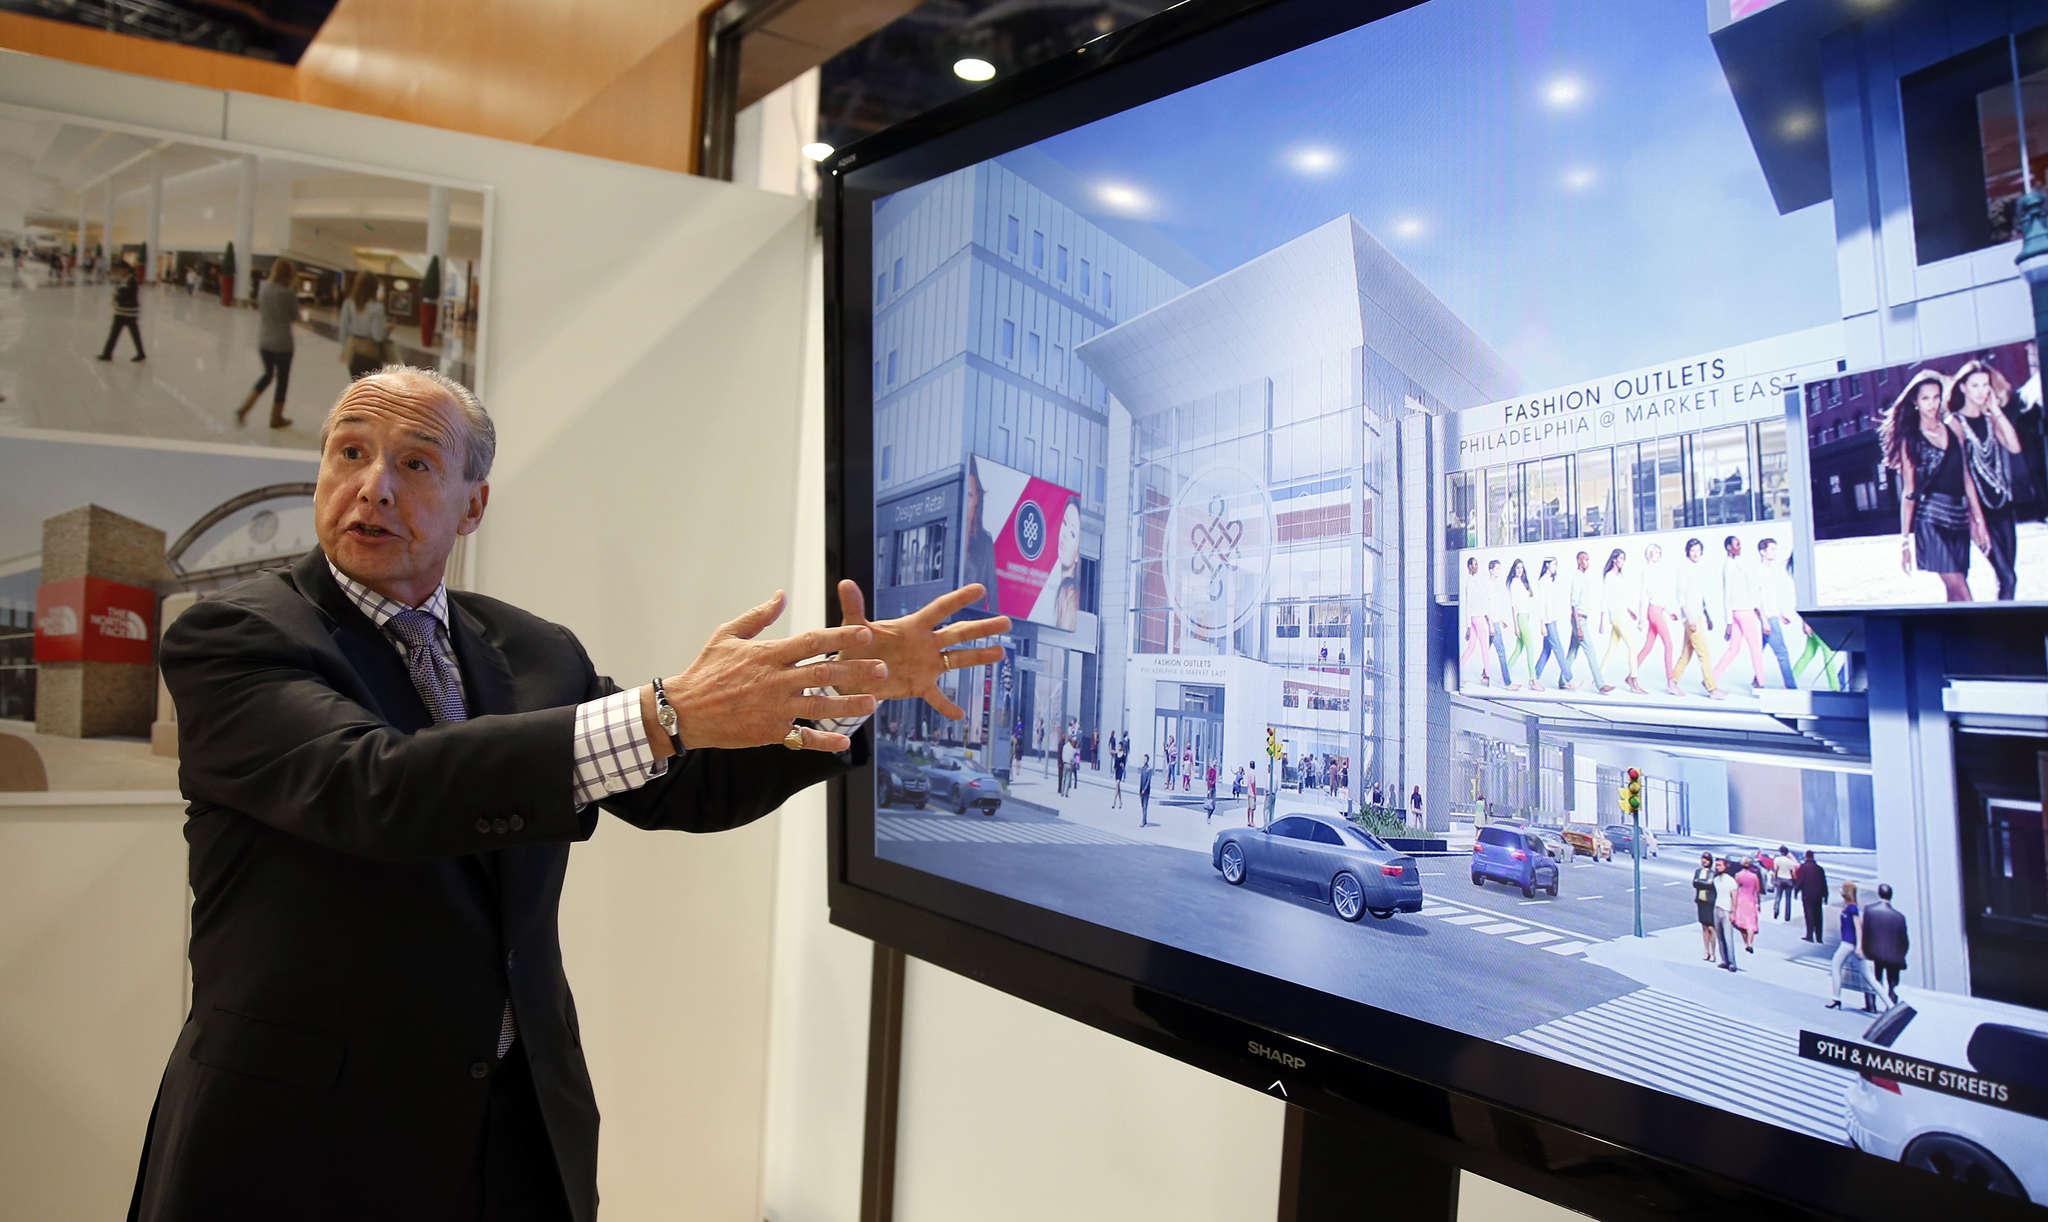 PREIT chief executive officer Joseph Coradino making a presentation at ReCon, a three-day gathering that drew more than 35,000 to Las Vegas.